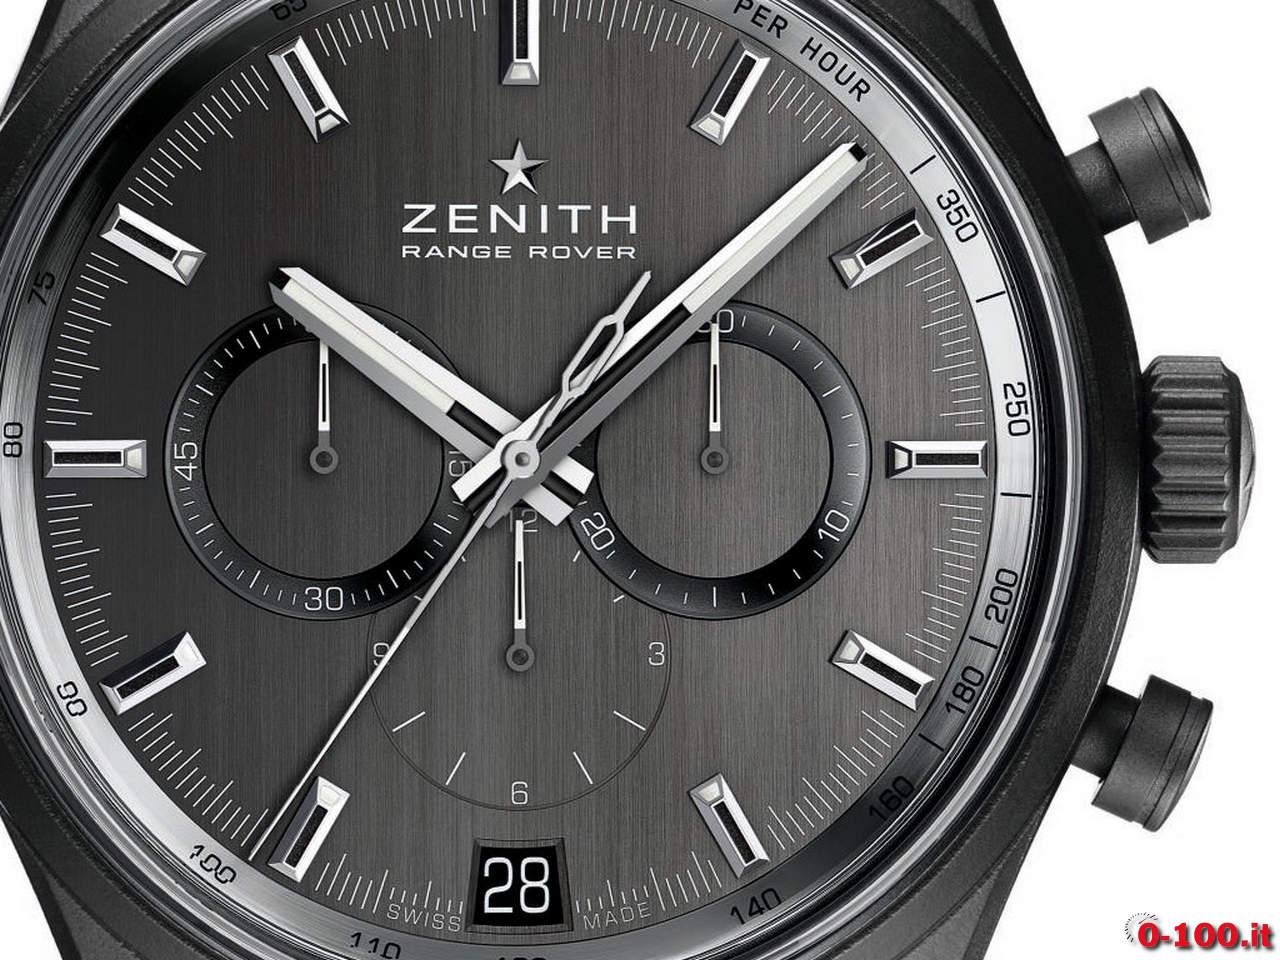 zenith-el-primero-range-rover-prezzo-price_0-100_15